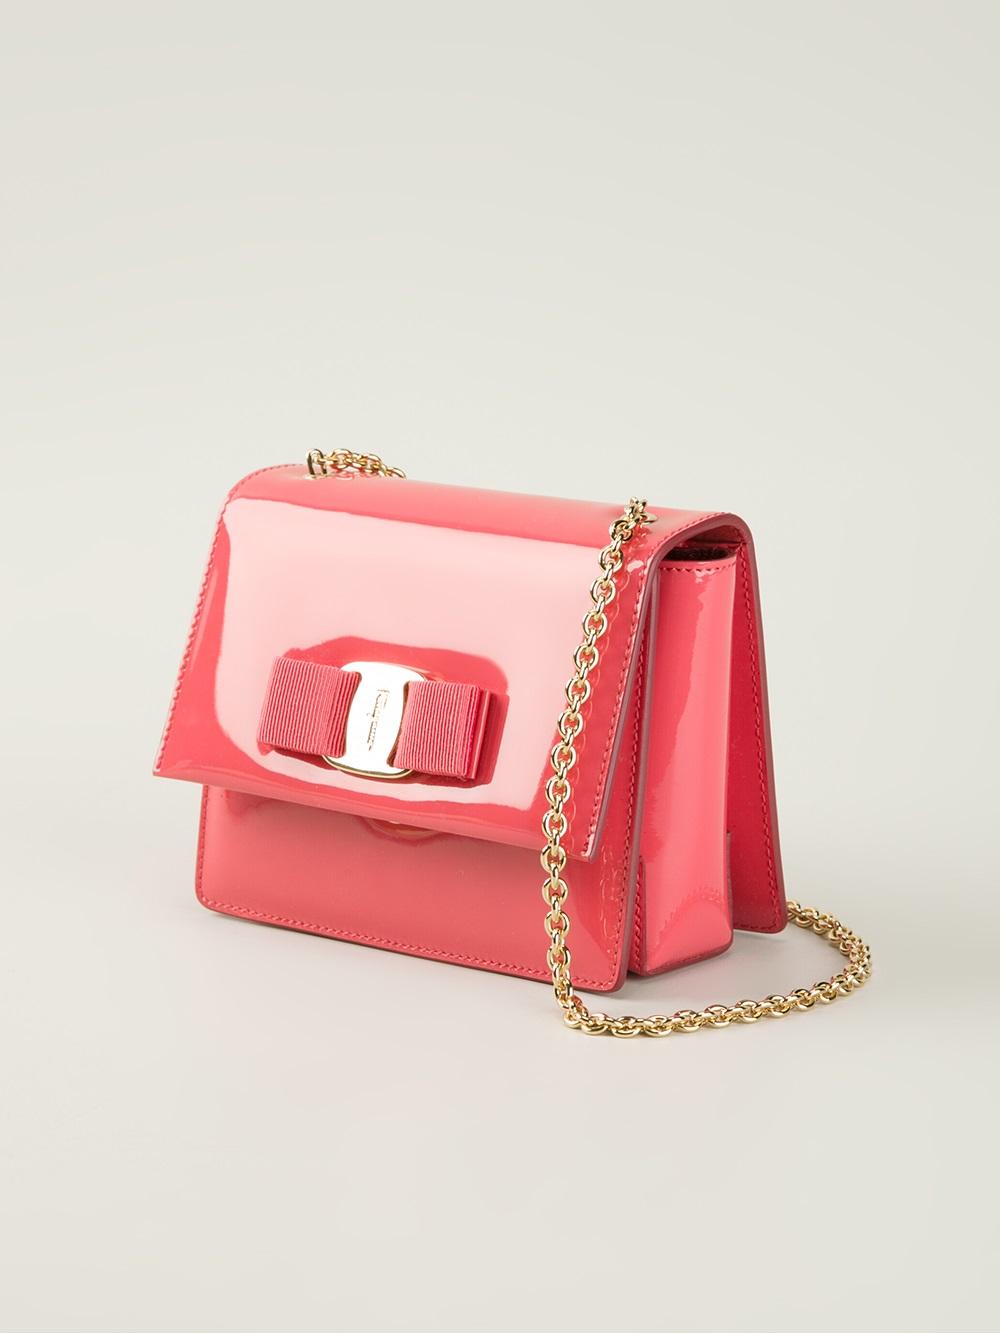 Ferragamo Ginny Cross Body Bag in Pink & Purple (Pink)